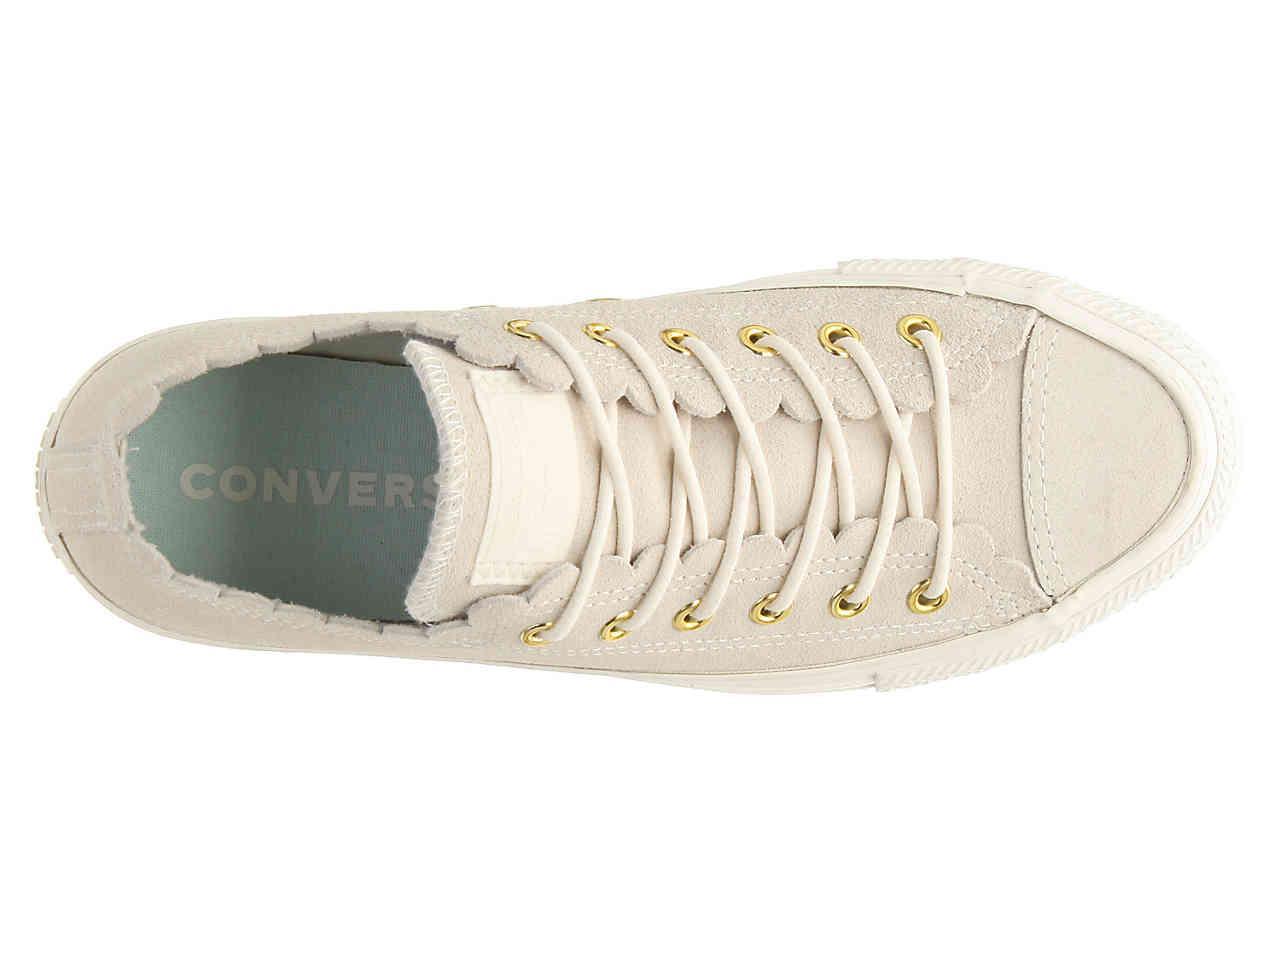 Chuck Taylor All Star Scallop Sneaker